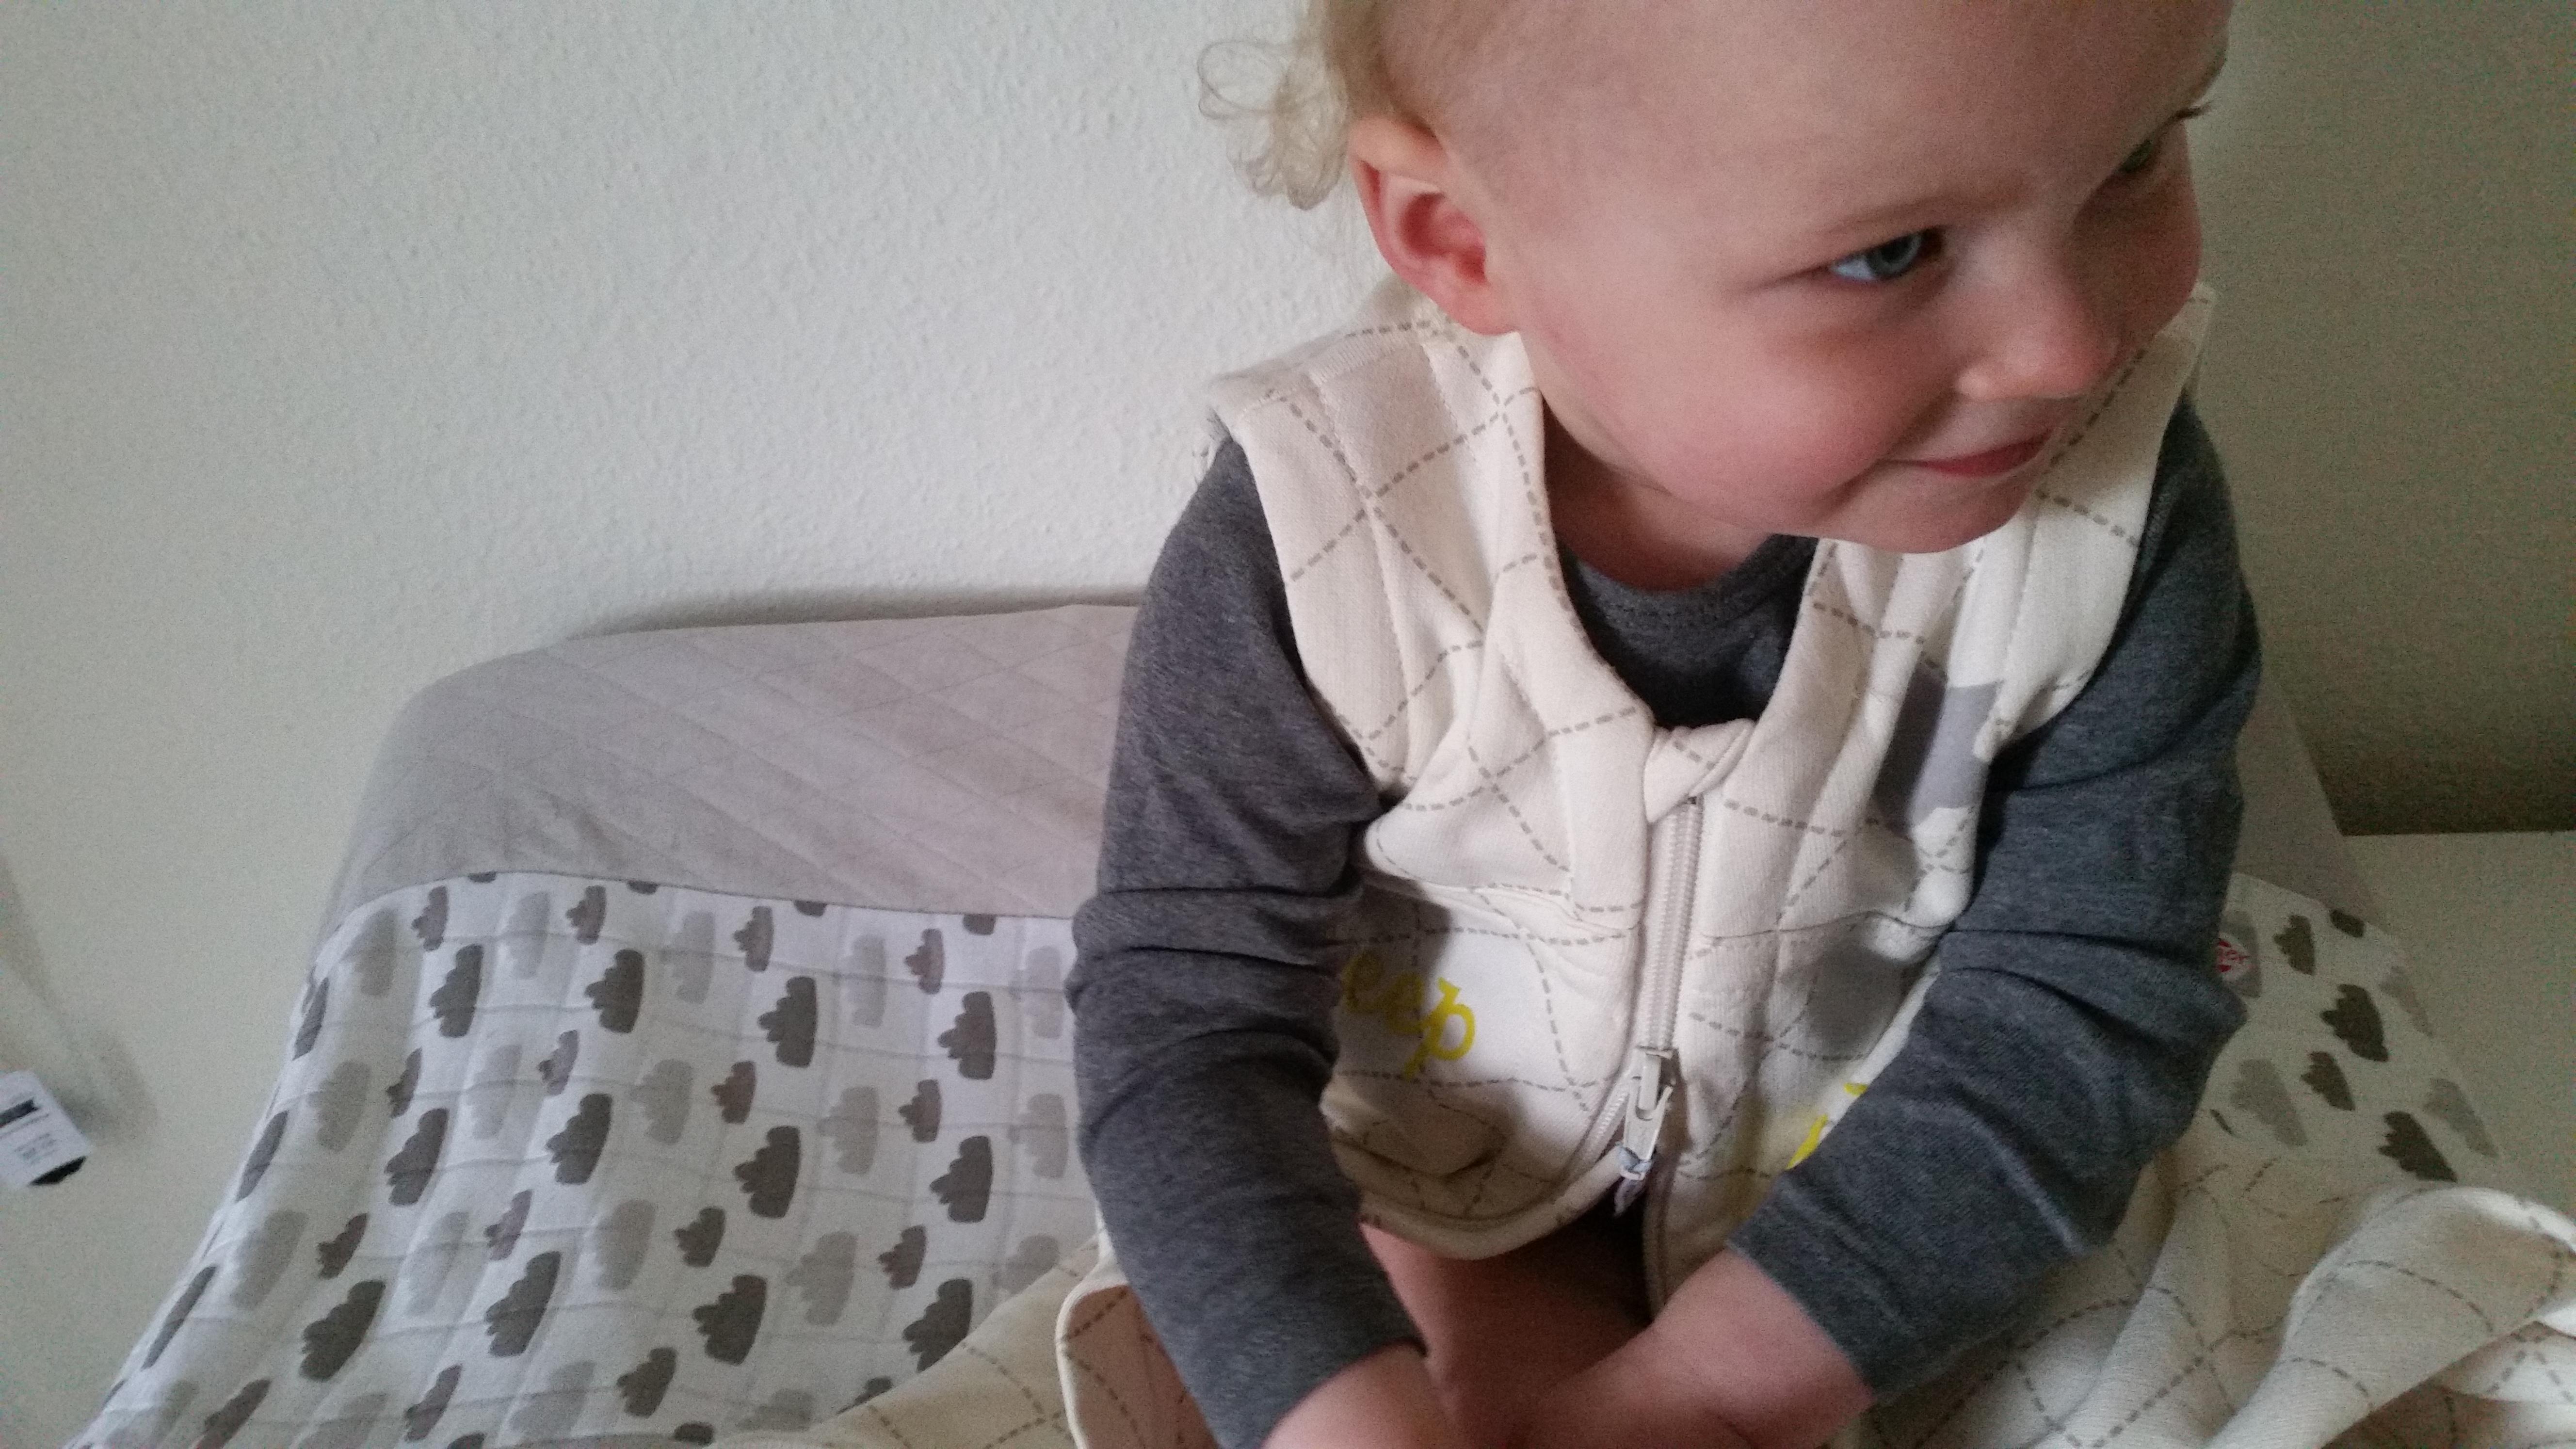 4-15-lodger-dekbed-laken-beddengoed-wolkje-taupe-creme-bruin-kinderkamer-babykamer-thema-wolken-baby-dreumes-ledikant-aerosleep-veilig-verschoonkussen-slaapzak